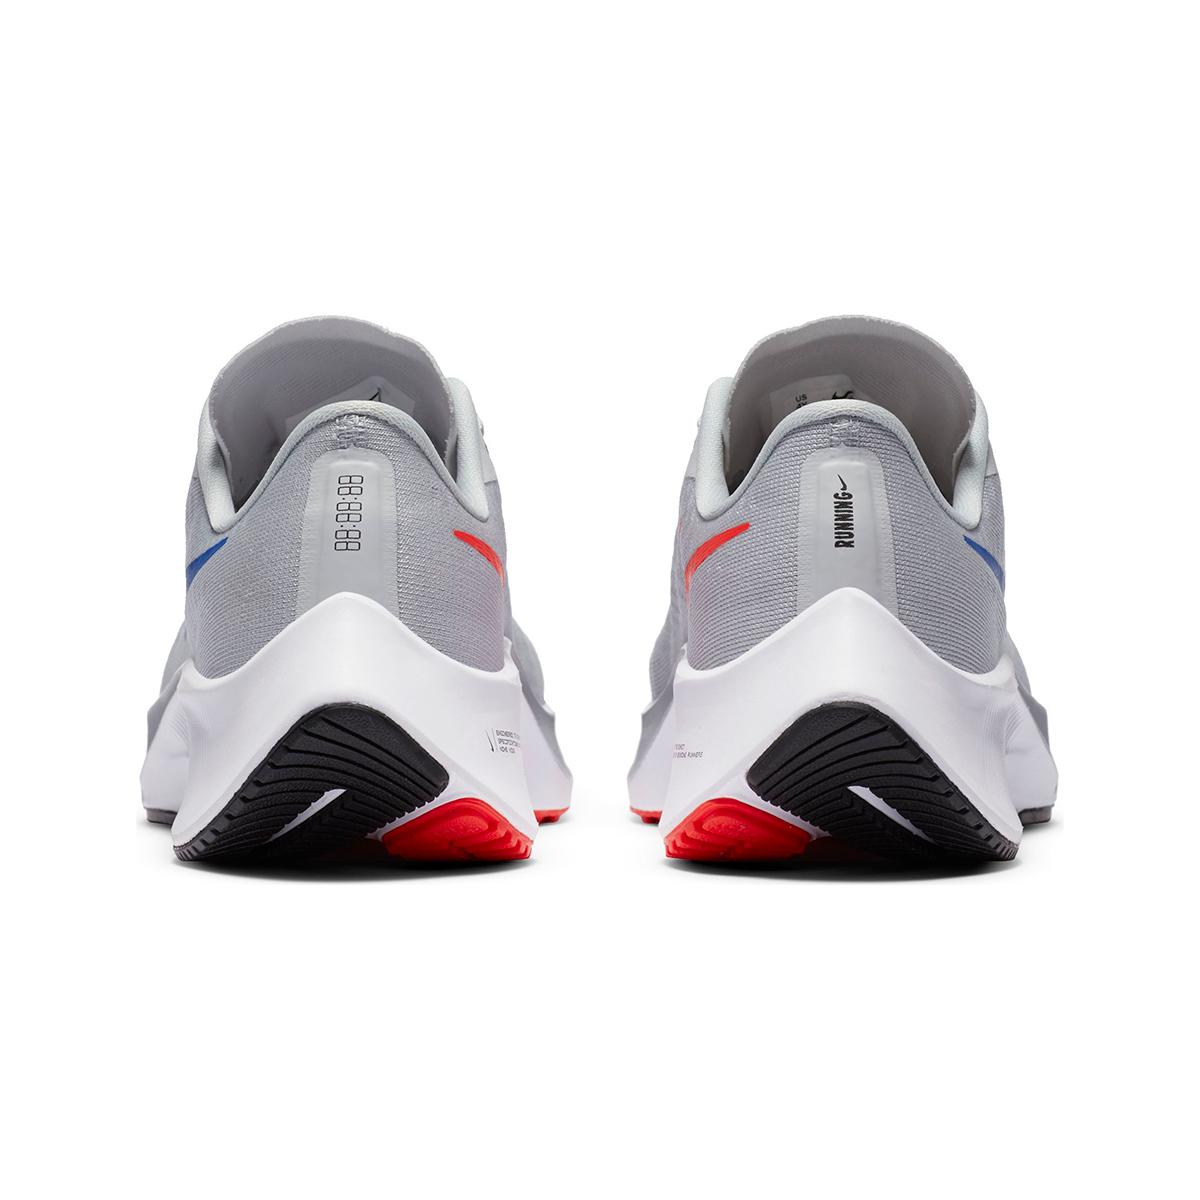 Kid's Nike Air Zoom Pegasus 37 Running Shoe - Color: Pure Platinum/Wolf Grey/Bright Crimson/Racer Blue - Size: 1 - Width: Regular, Pure Platinum/Wolf Grey/Bright Crimson/Racer Blue, large, image 3